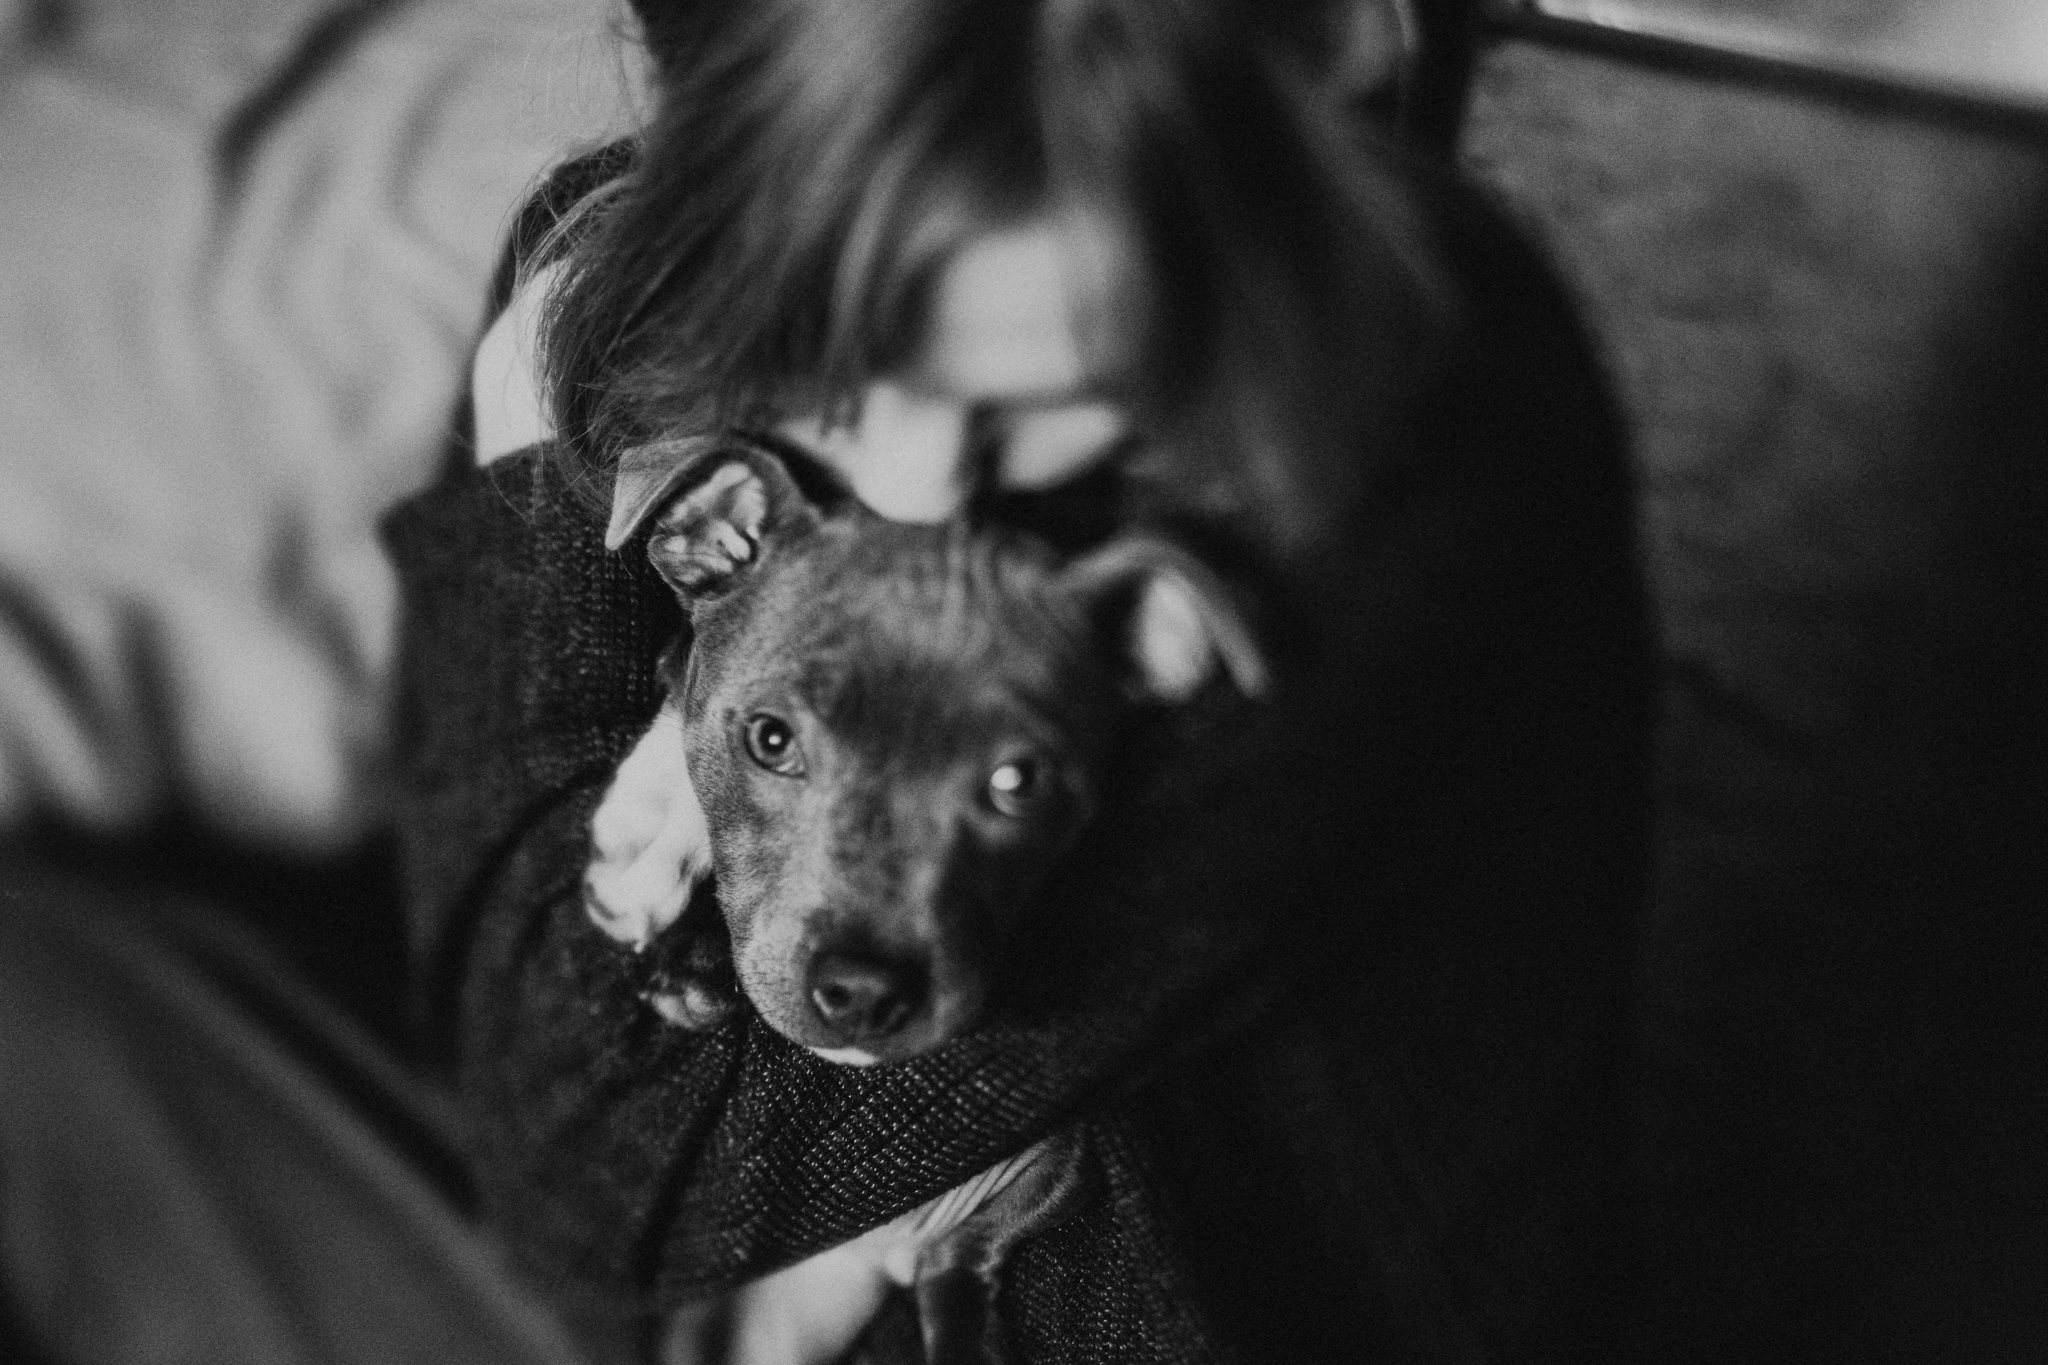 Dog-Human-Session-Photography-Darina-Stoda-Animal-Indigo-13.jpg